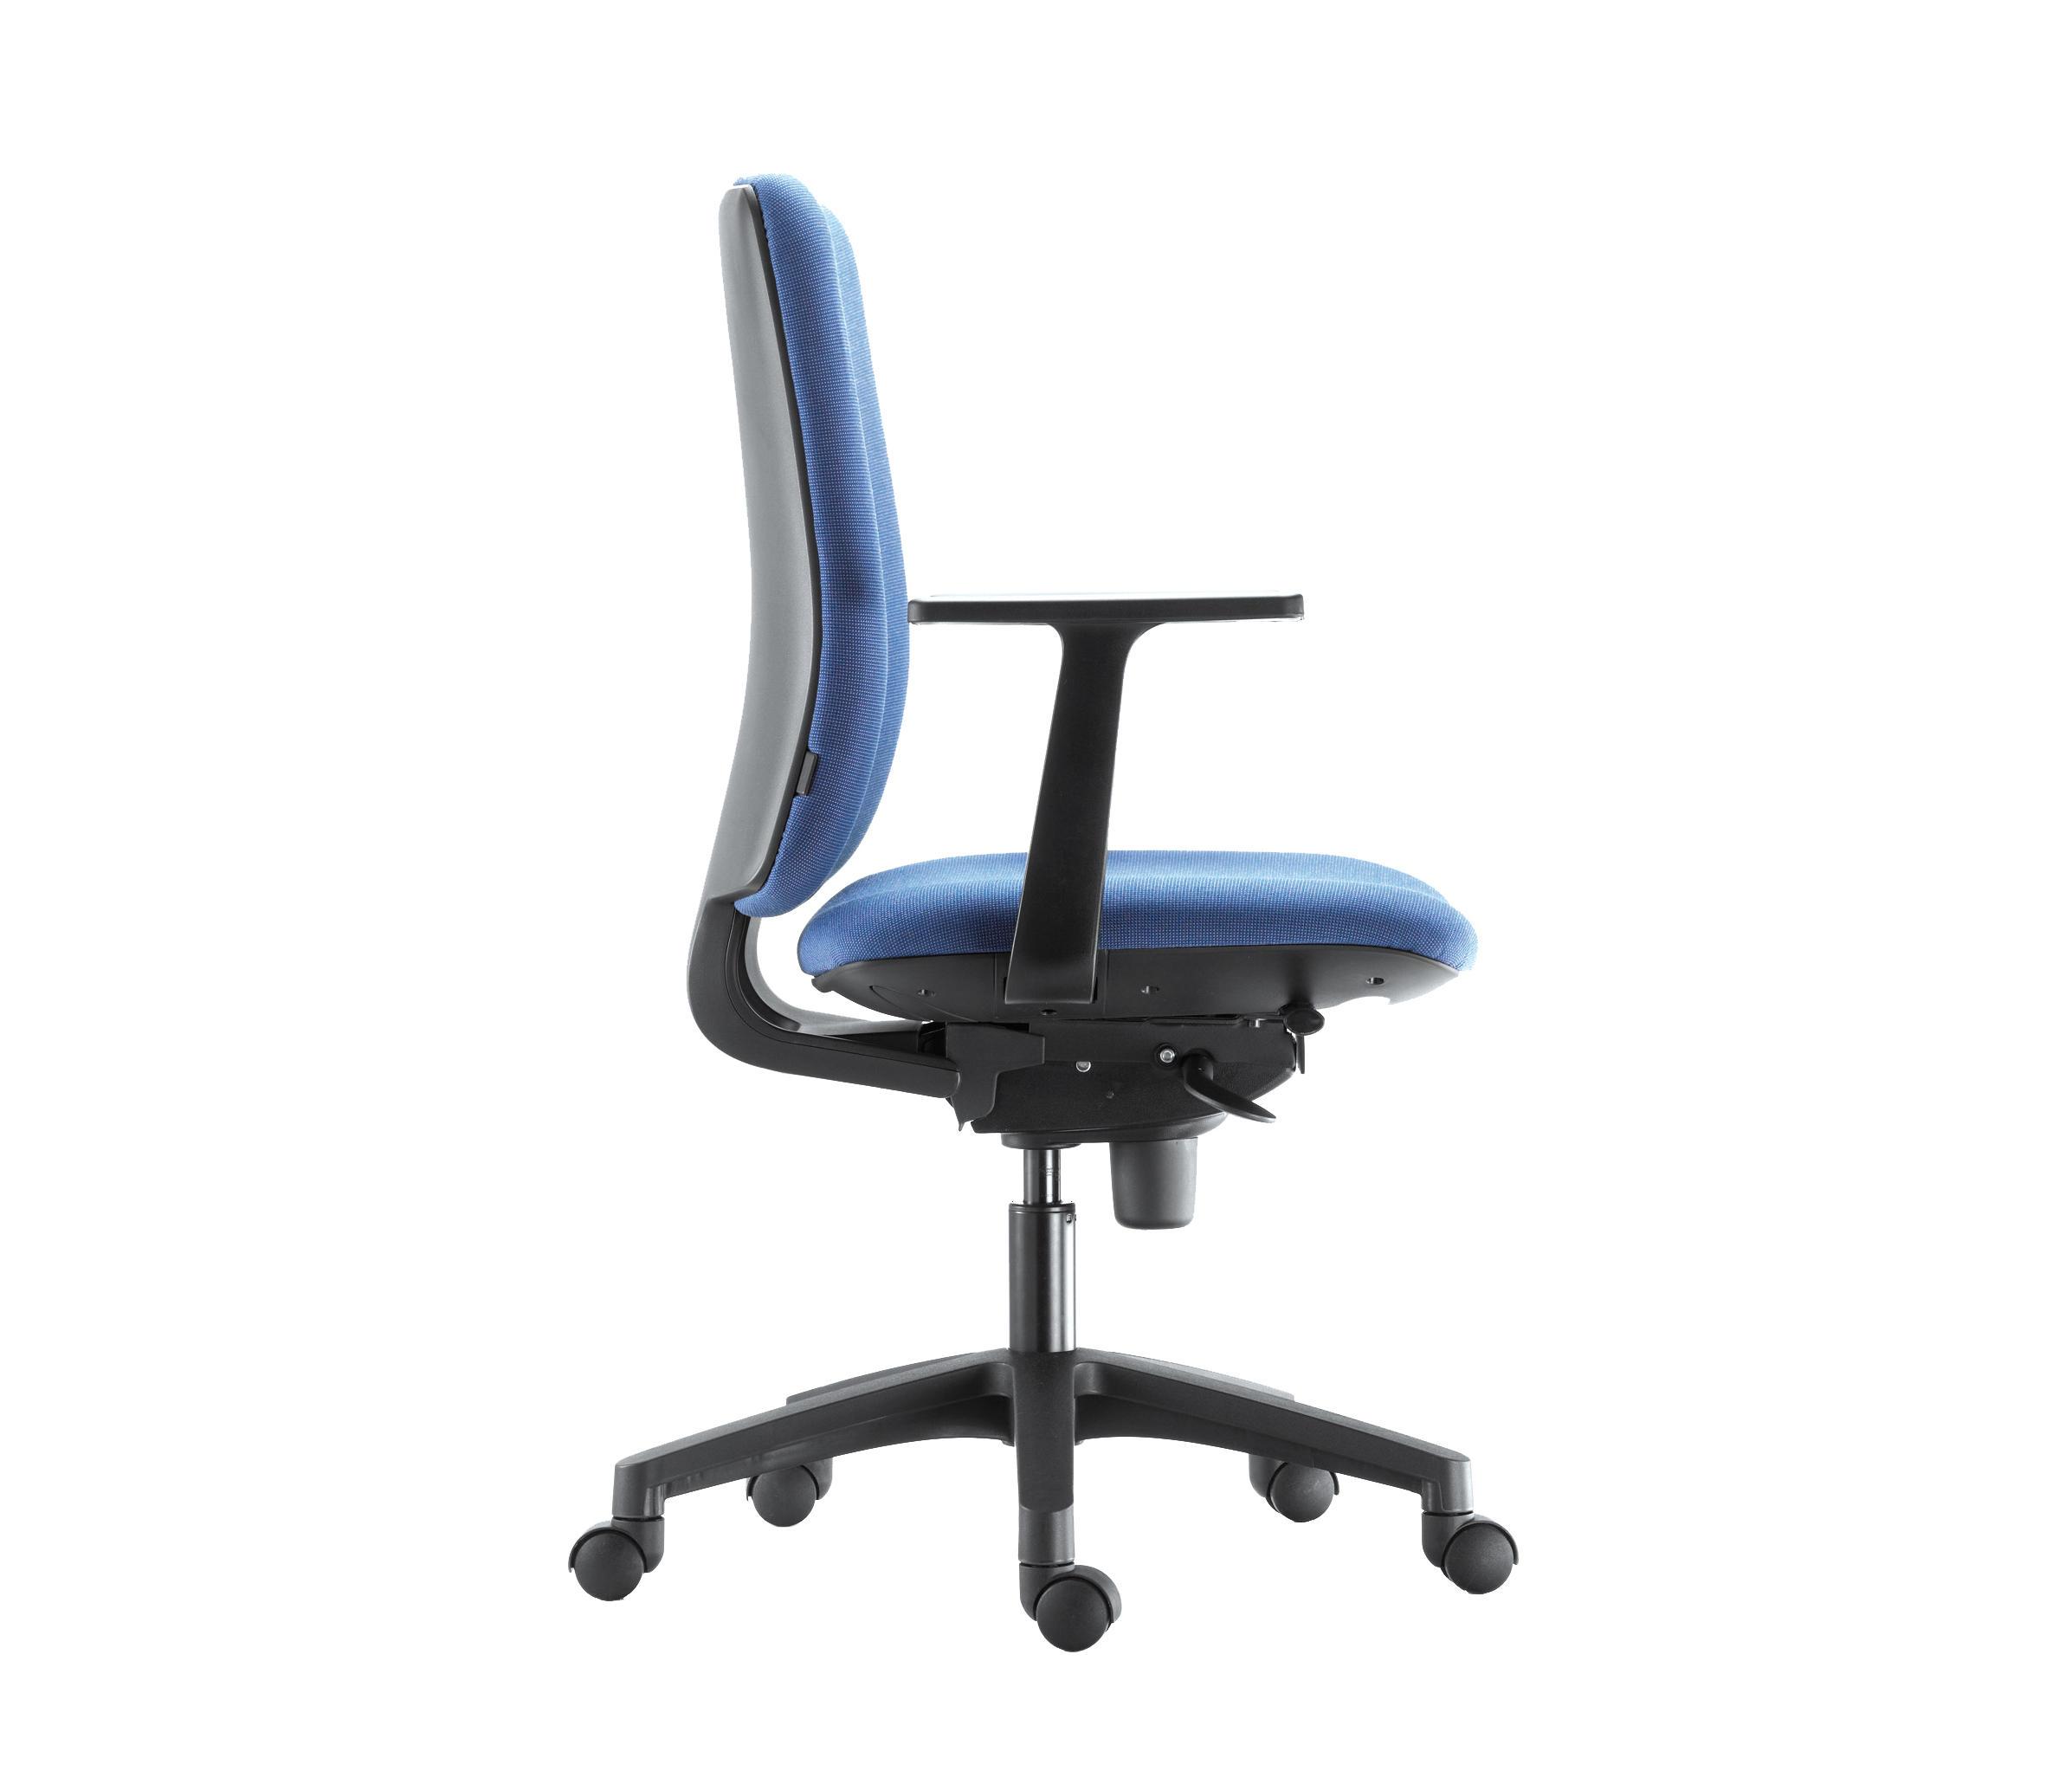 Sentis sillas de oficina de forma 5 architonic for Silla sentis forma 5